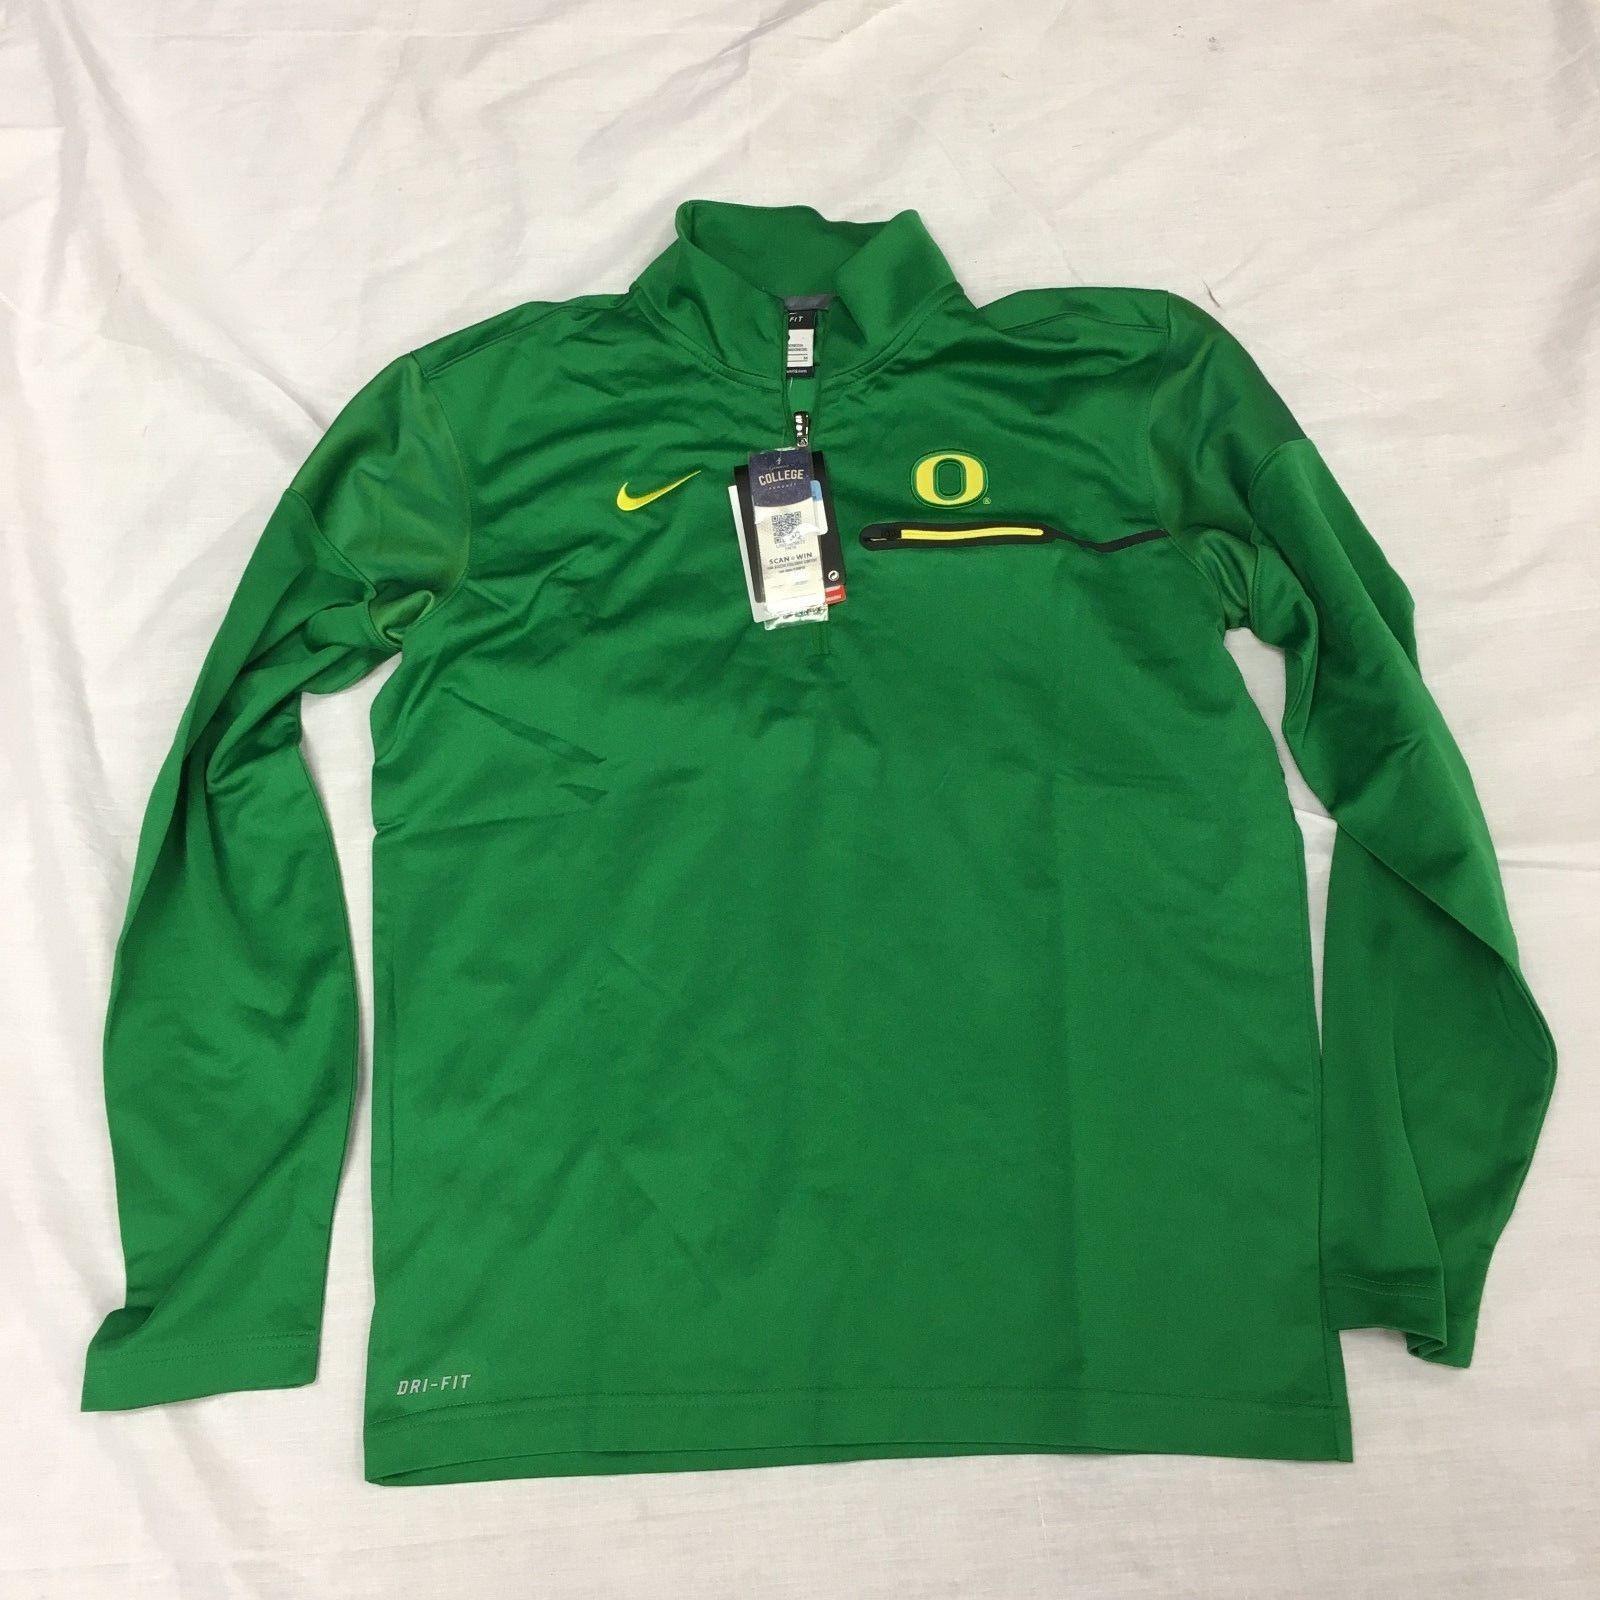 d4a626c45eb NWT New Oregon Ducks Nike Dri-Fit Coaches HZ and 50 similar items. S l1600